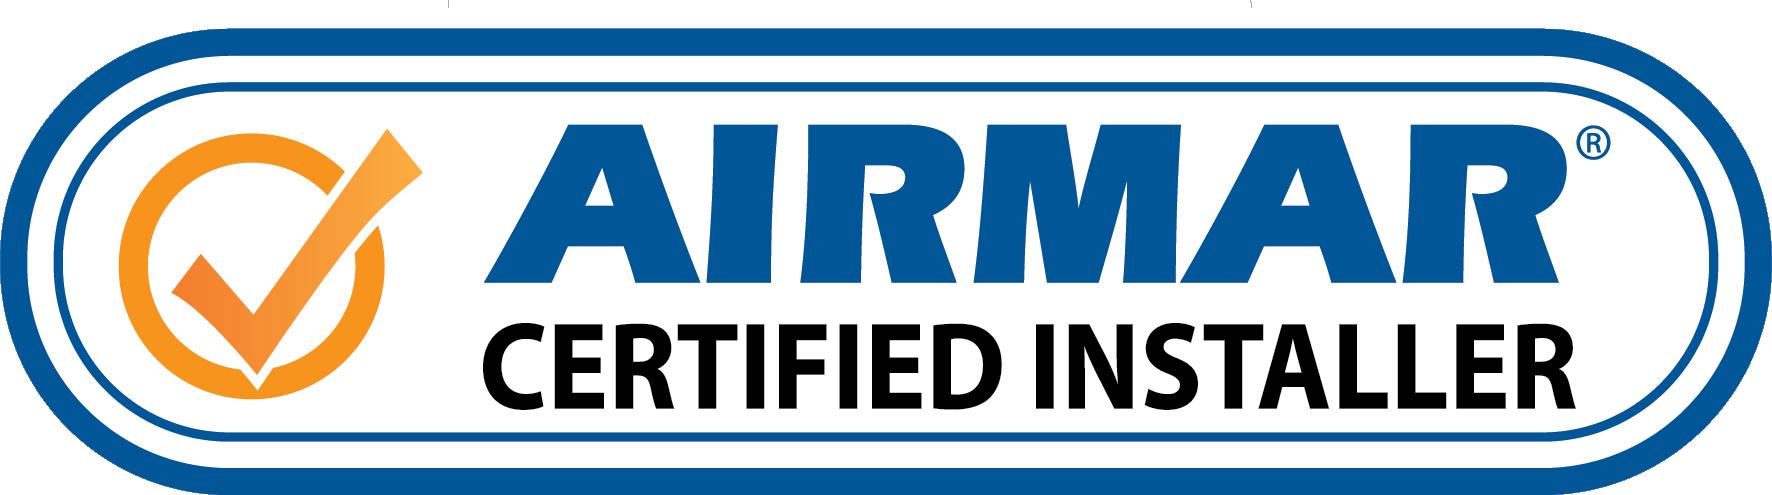 ACI_Certified_Installer_final_white.png